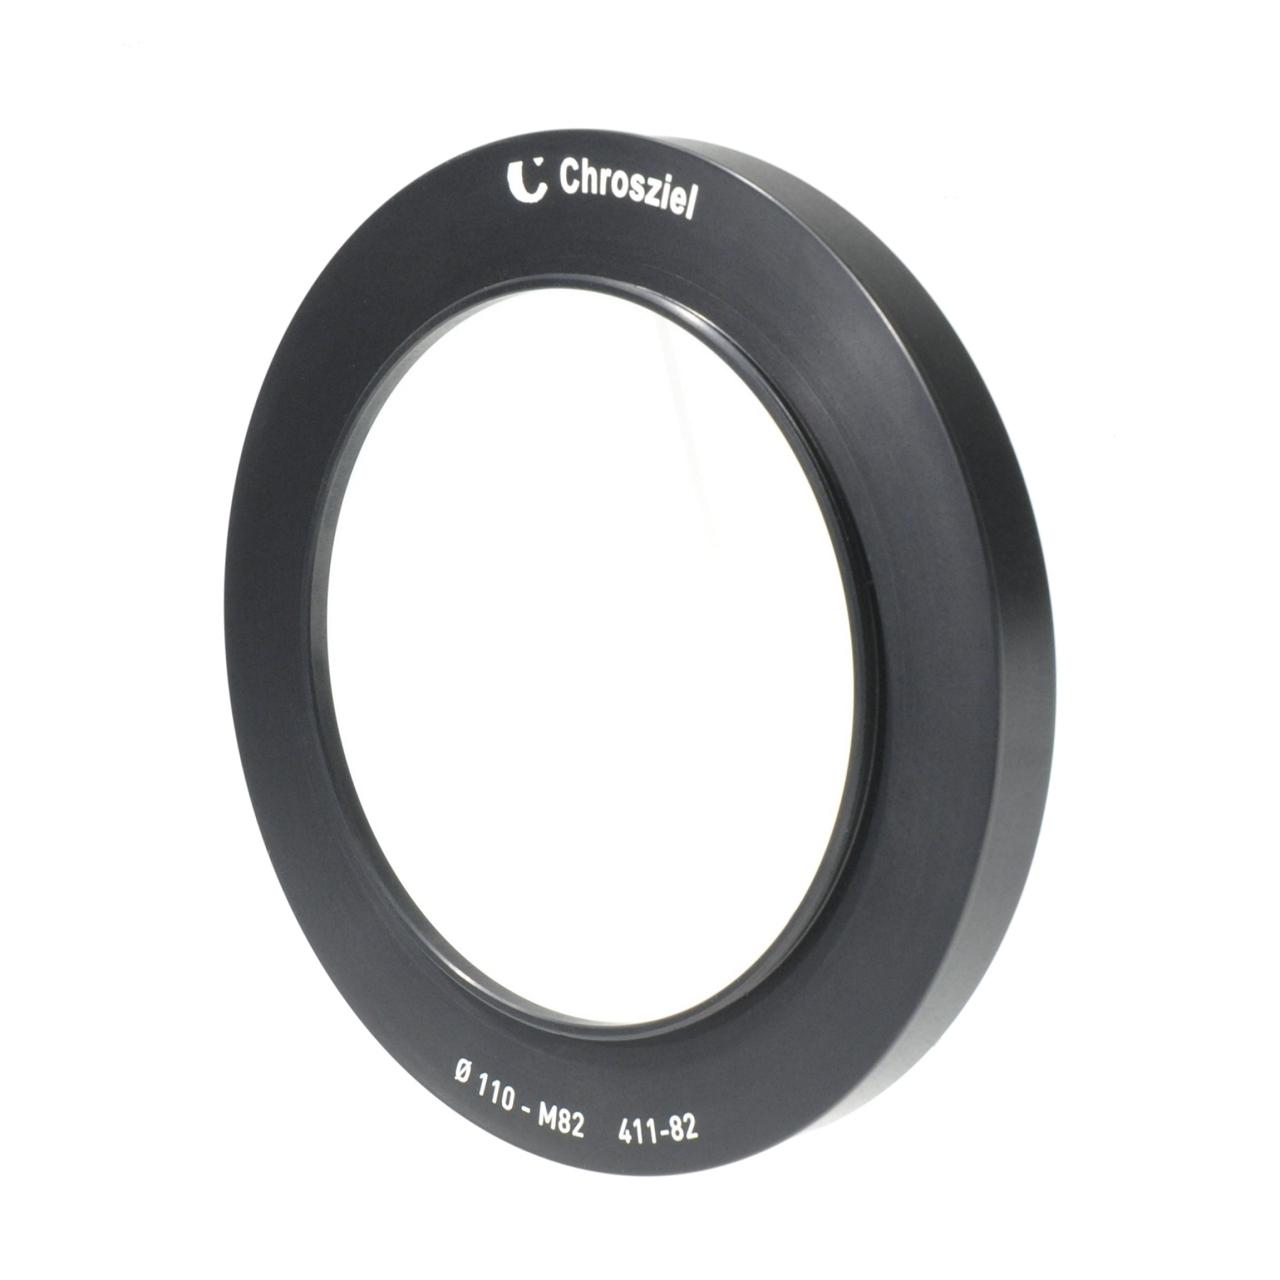 Adapter Ring Ø110:M 82 mm